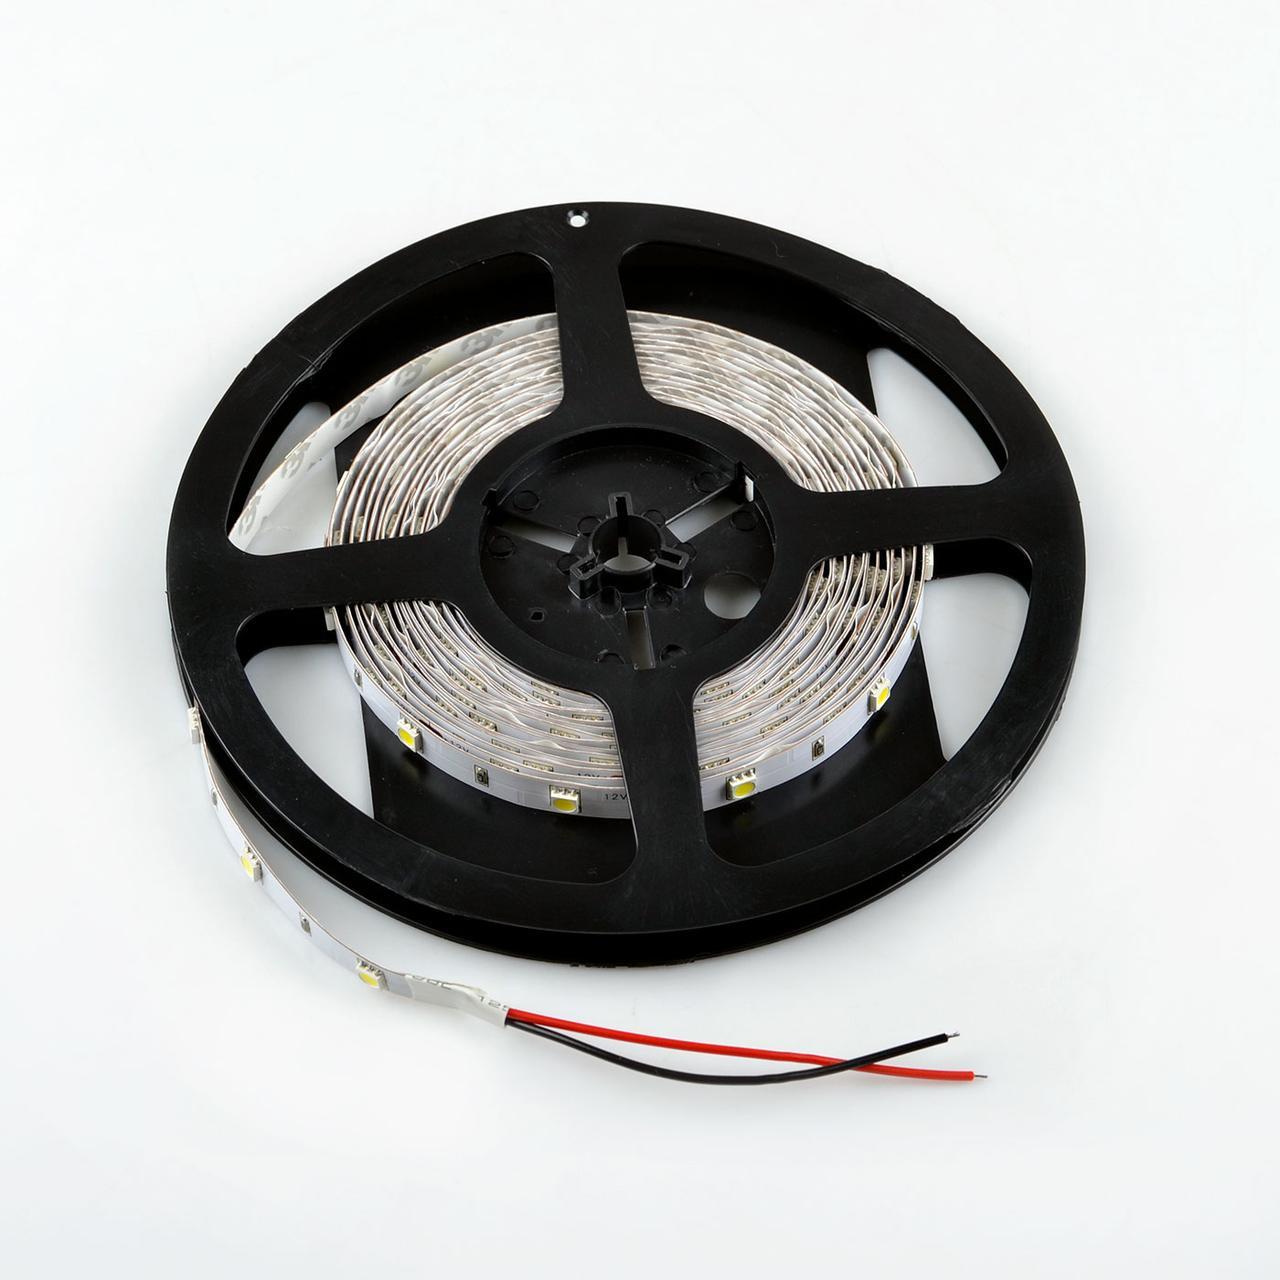 Светодиодная лента Venom SMD 5050 30д.м. (IP33) Standart (VST-5050120300-W)